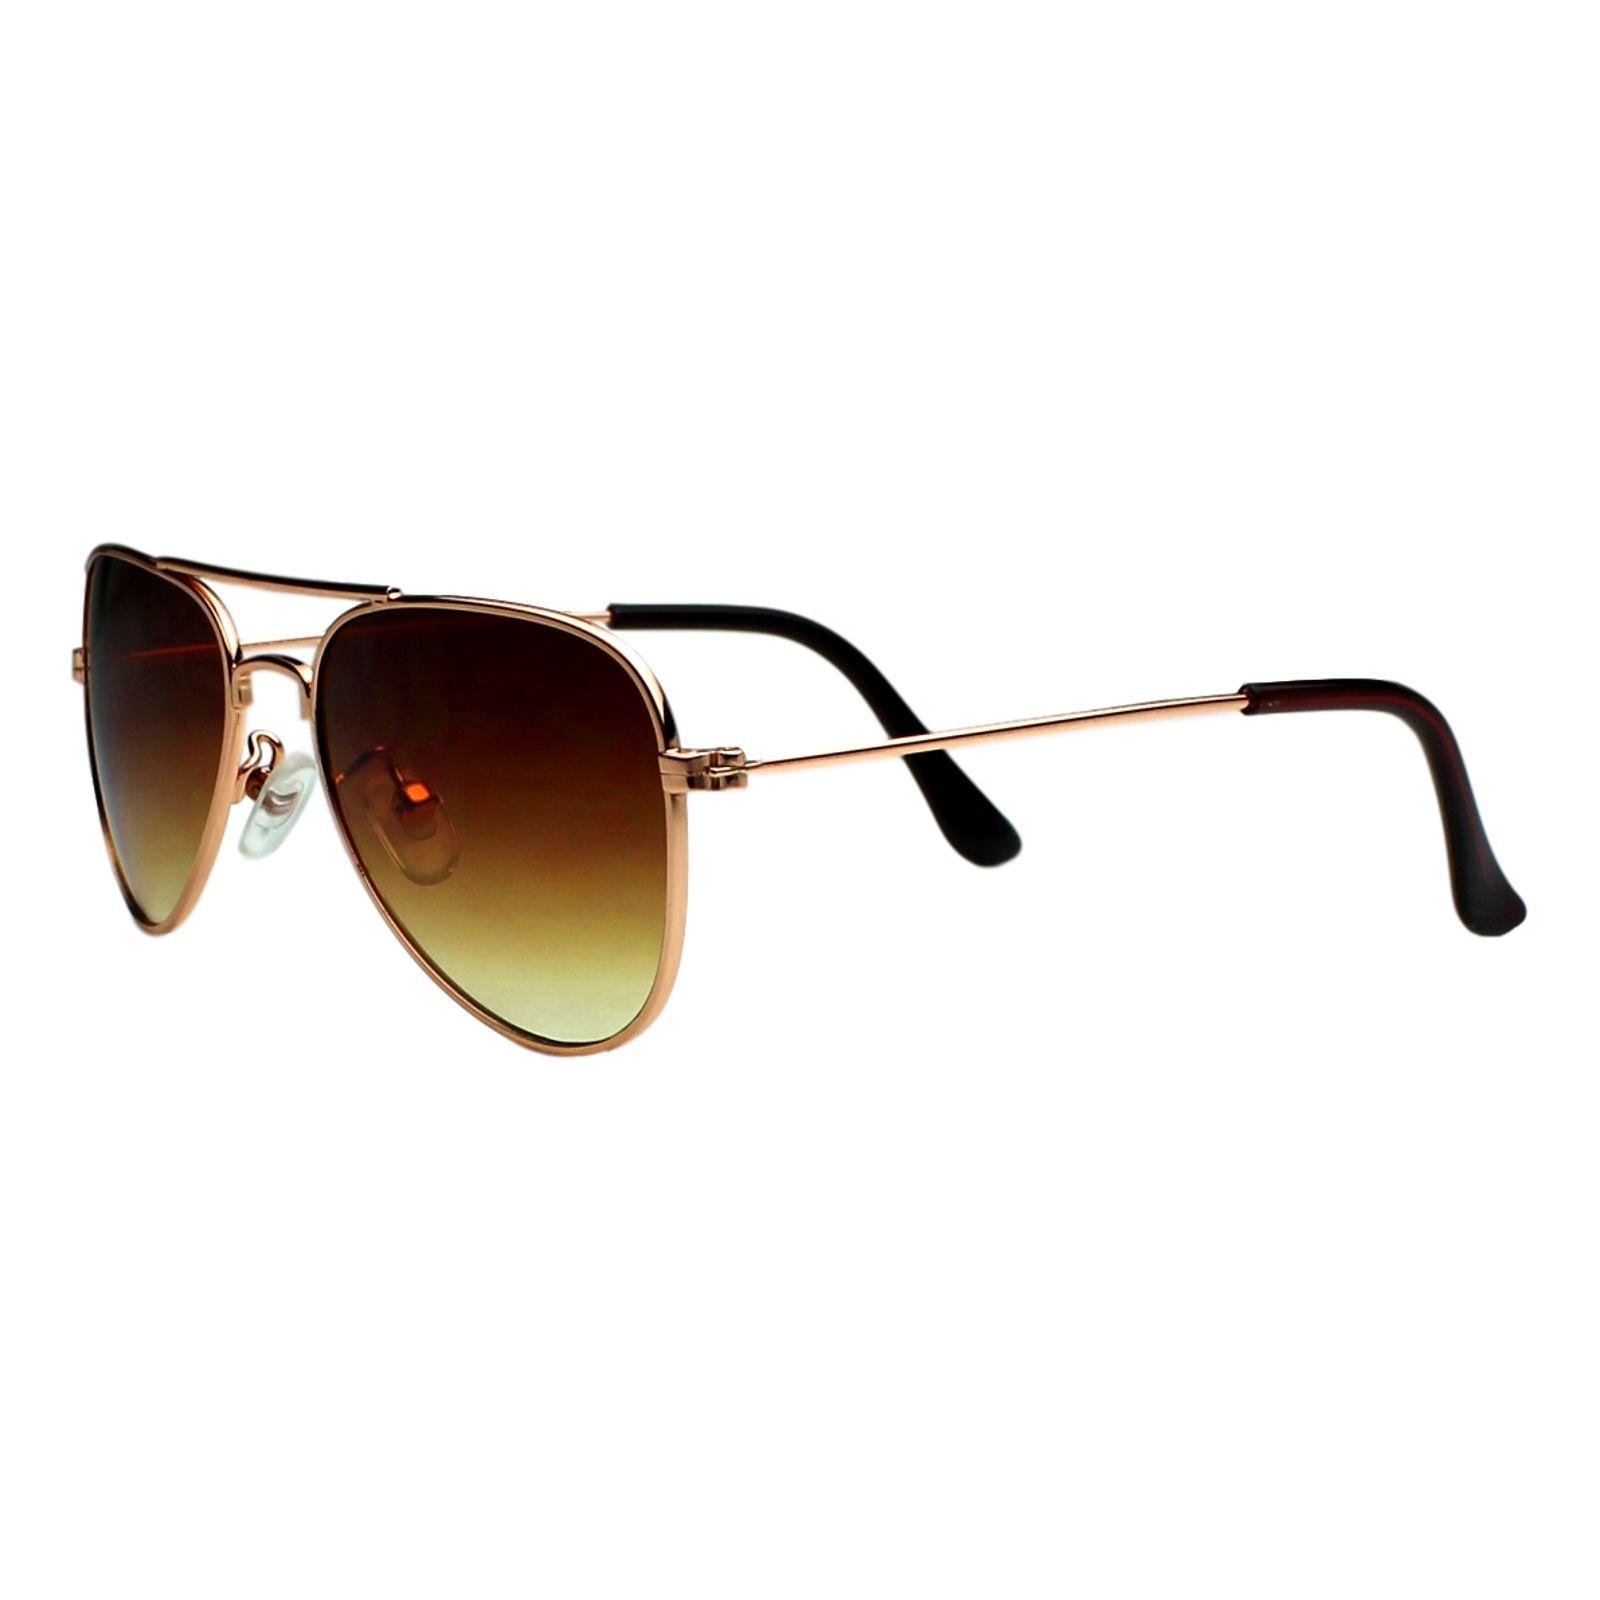 Óculos de Sol Díspar ID1903 infantil - Dourado